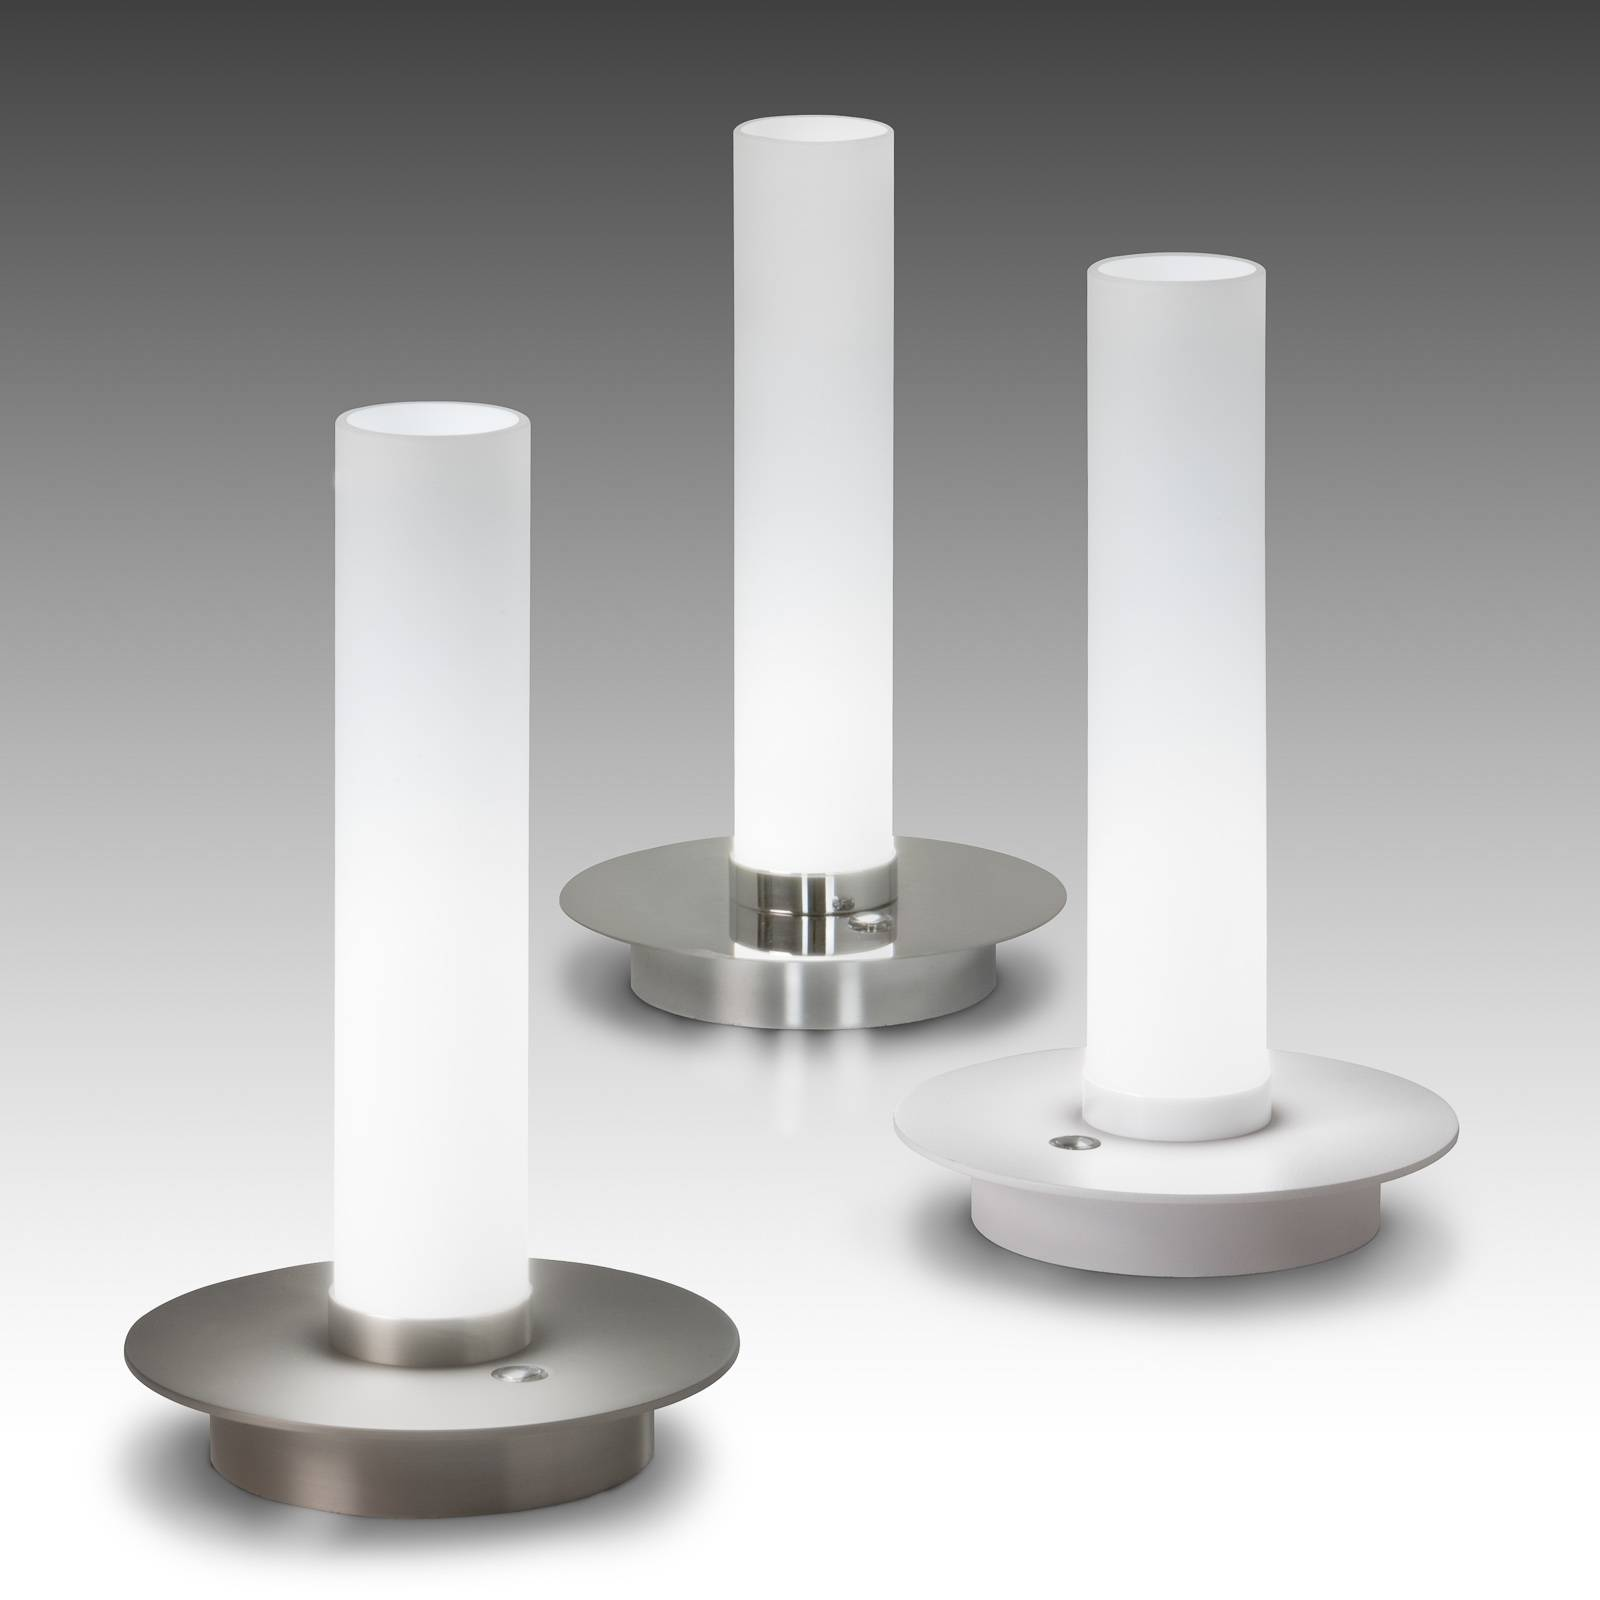 LED-pöytälamppu Candle, kromi